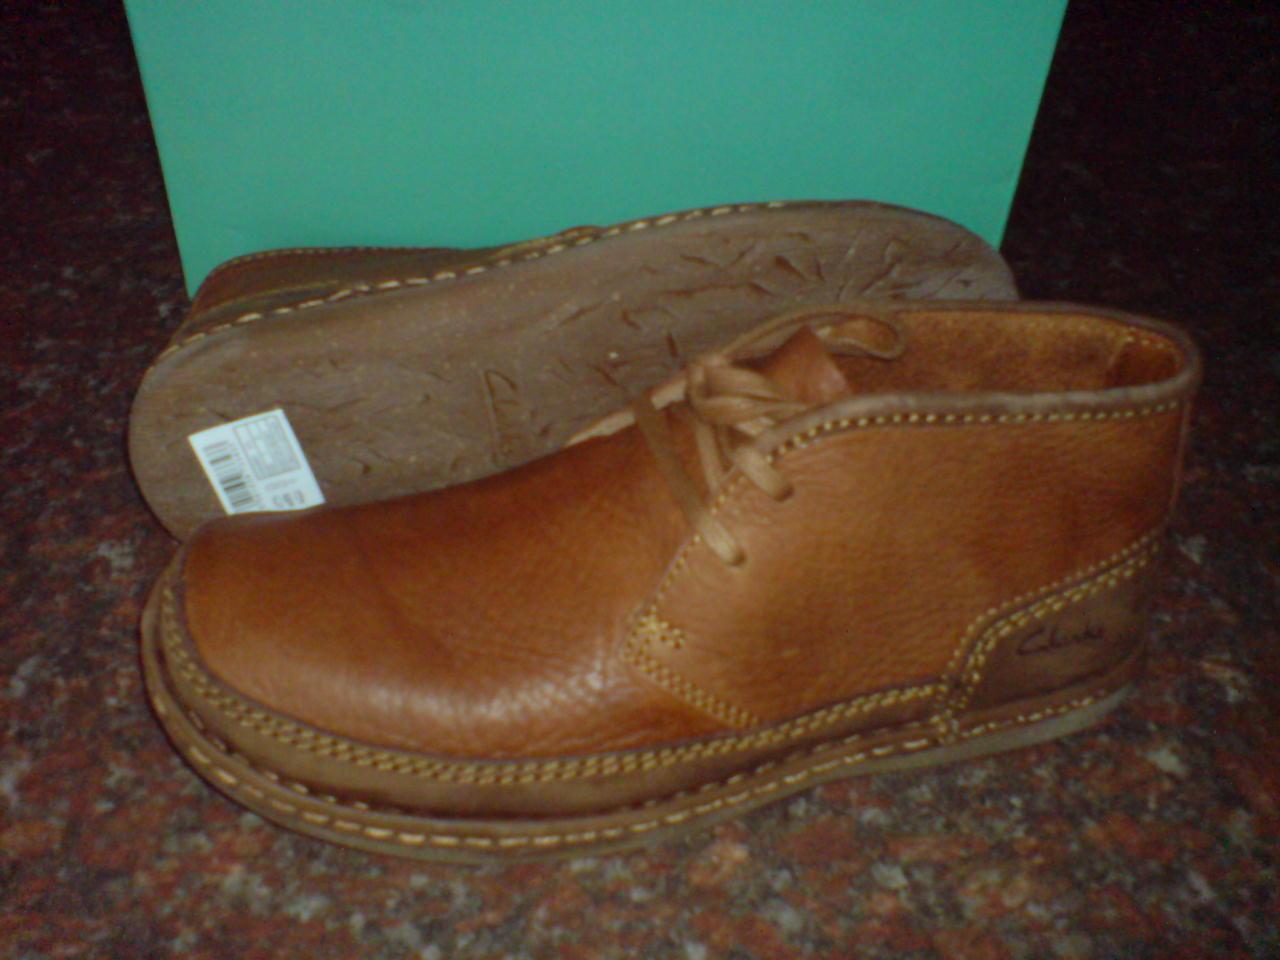 New Clarks  Mens  RISHTON HEIGHT BOOTS  TOBACCO  UK 8,9,10